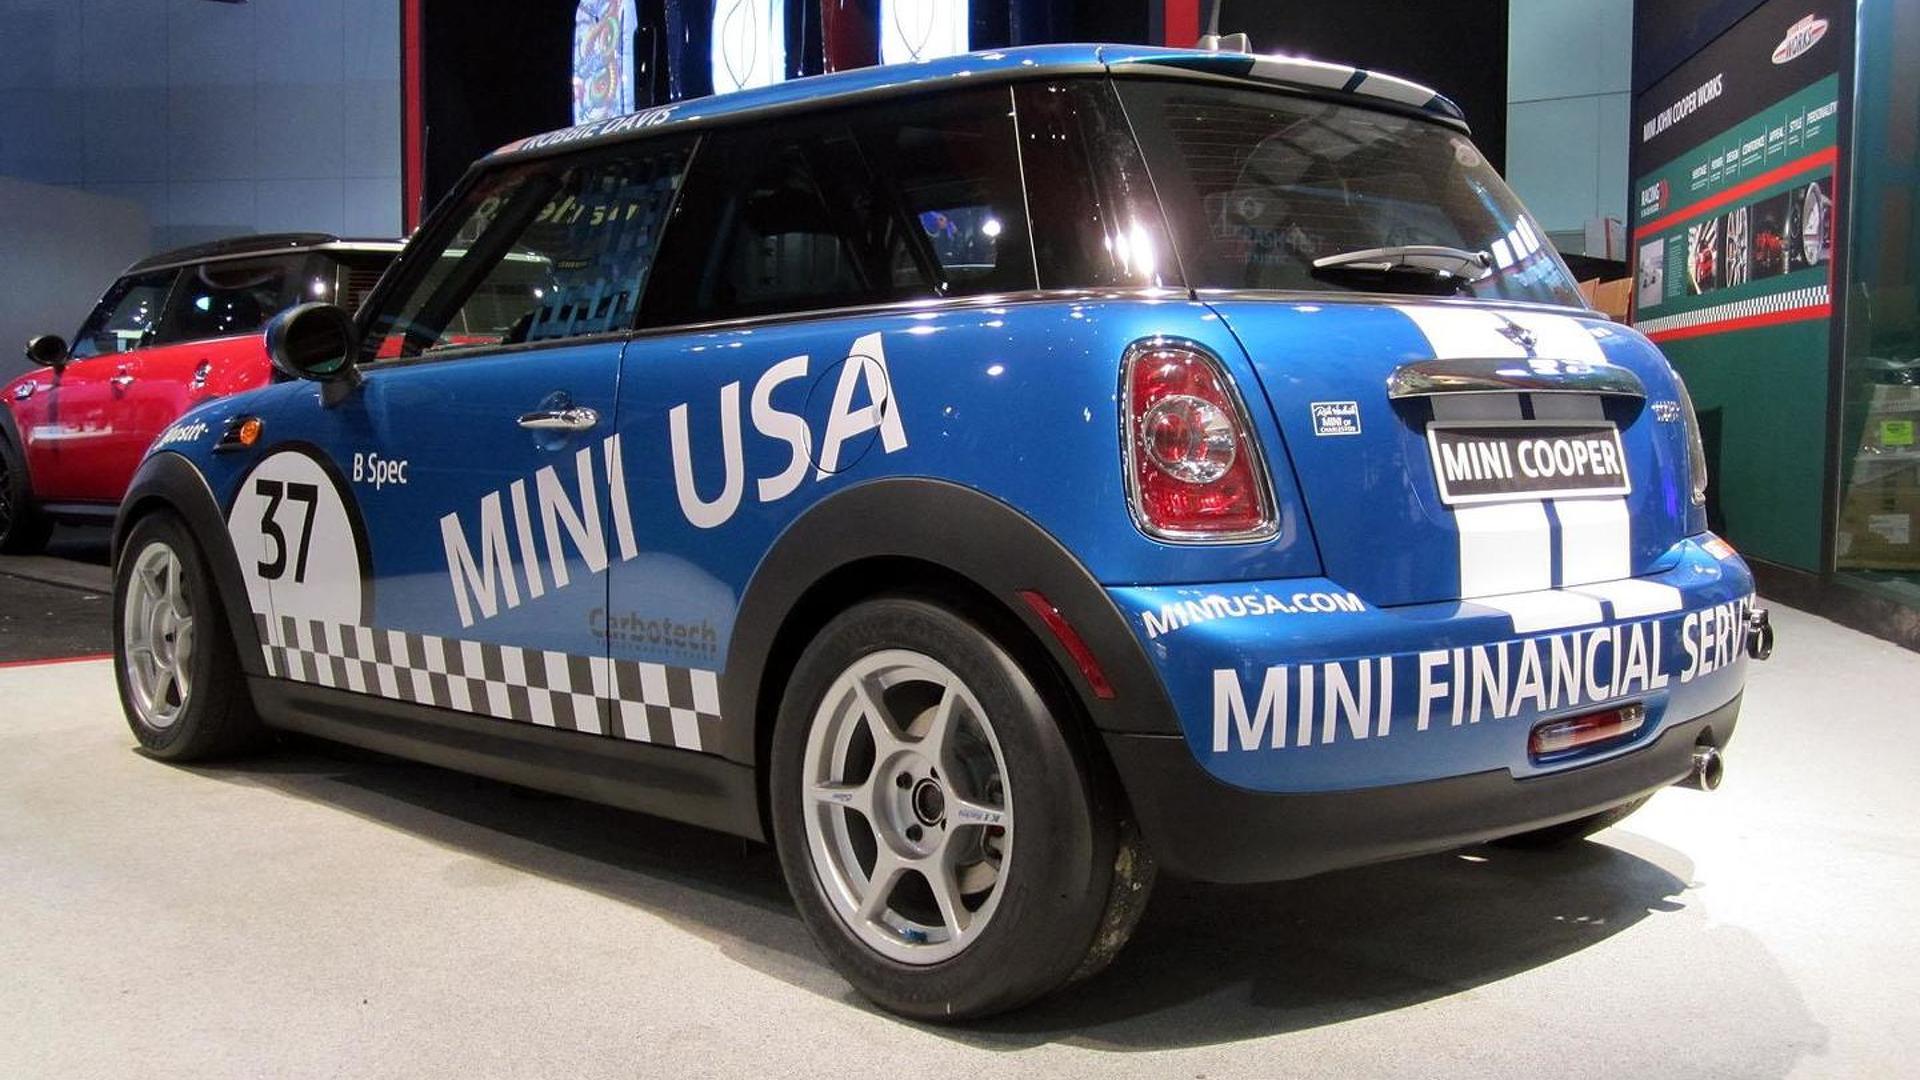 MINI Cooper B Spec racer introduced